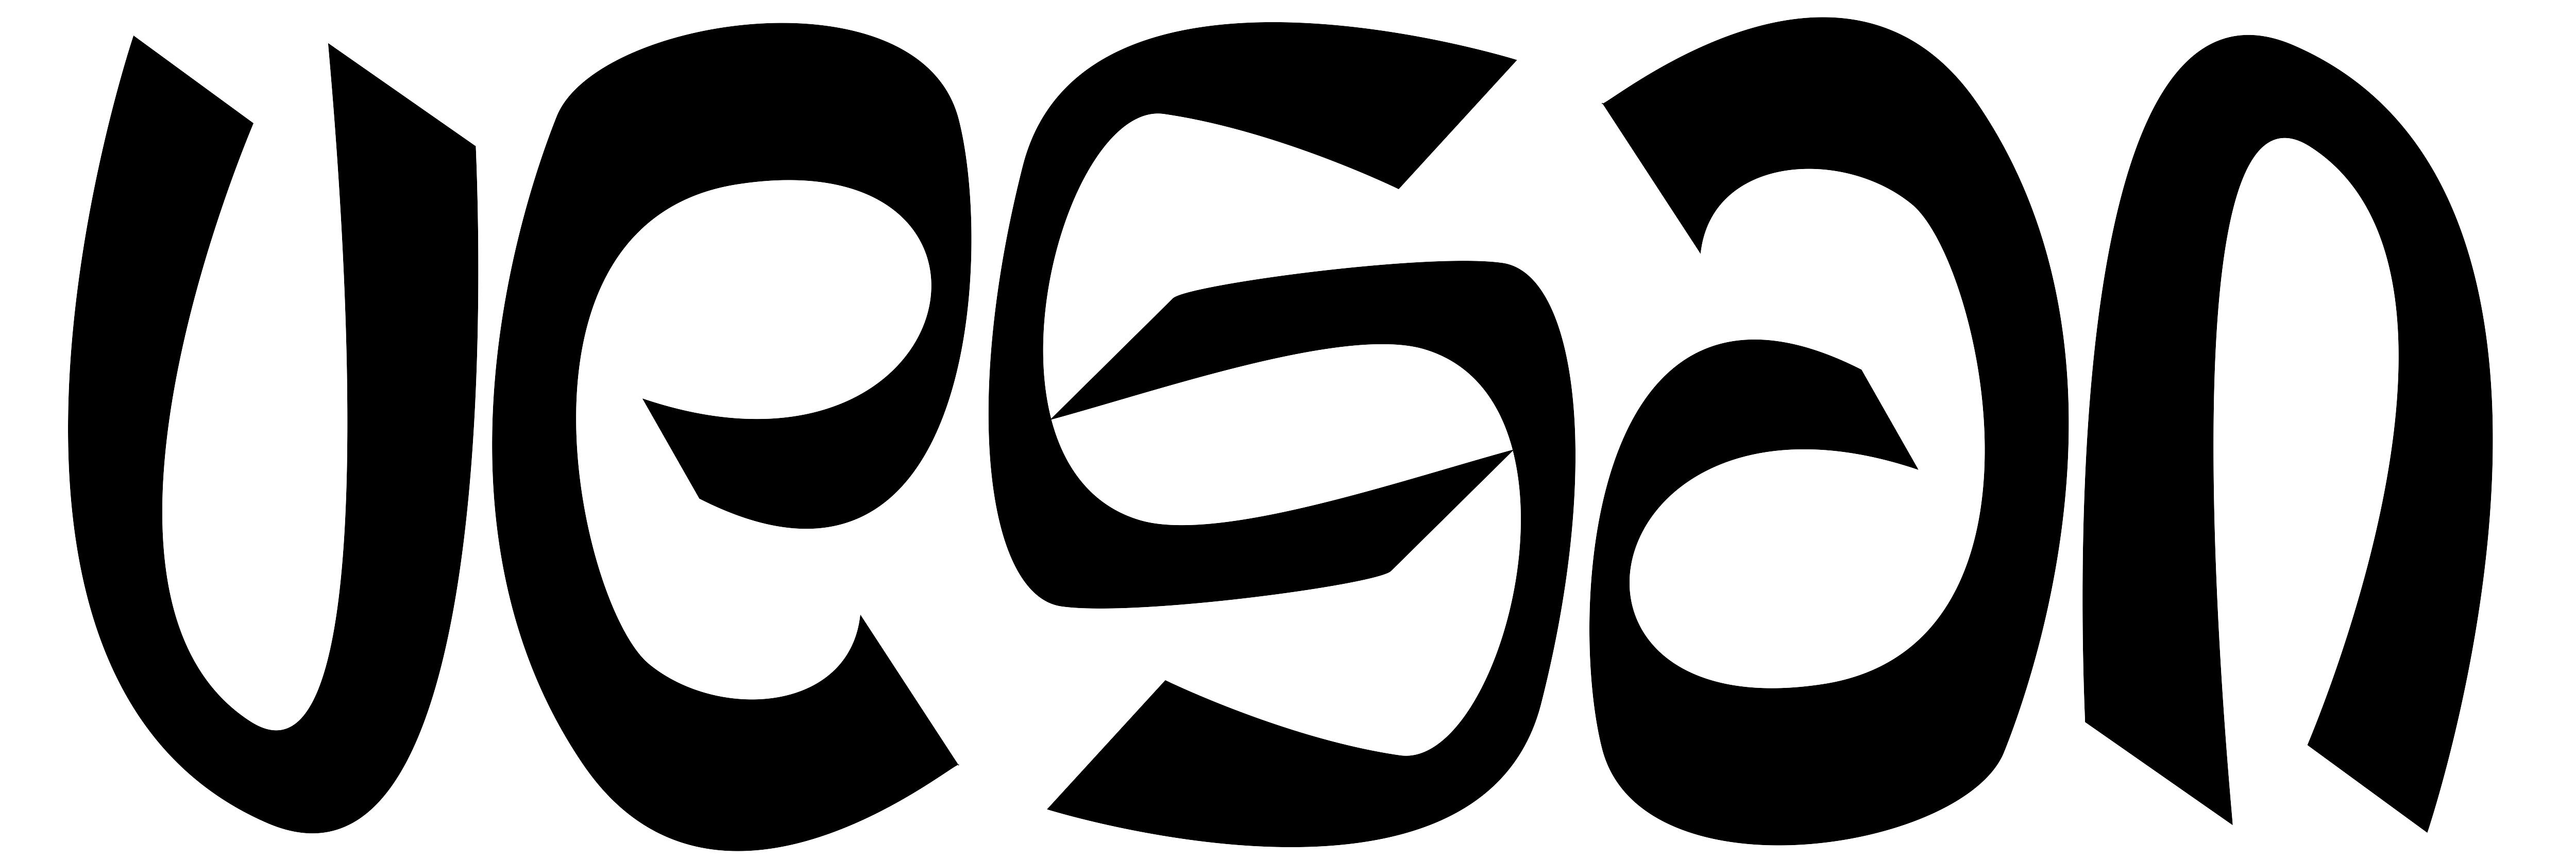 Ⓥ - Vegan Symbols / Emojis / Copyright-Free Clipart | Copy/Paste